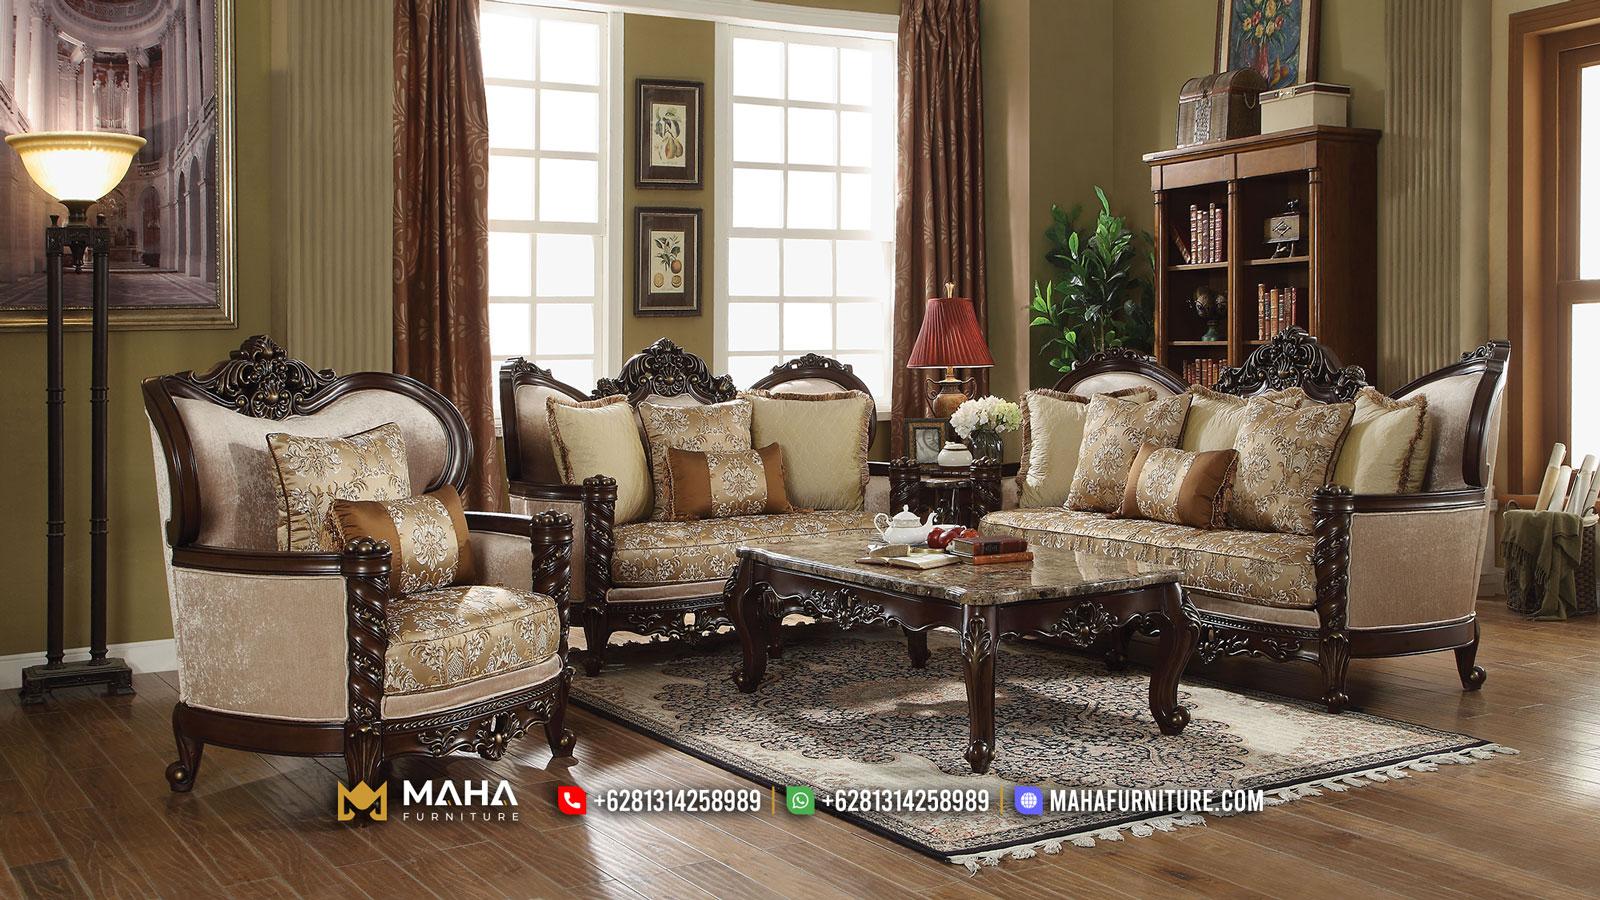 Beauty Set Sofa Tamu Mewah Ukir Jepara Natural Jati Perhutani MF12